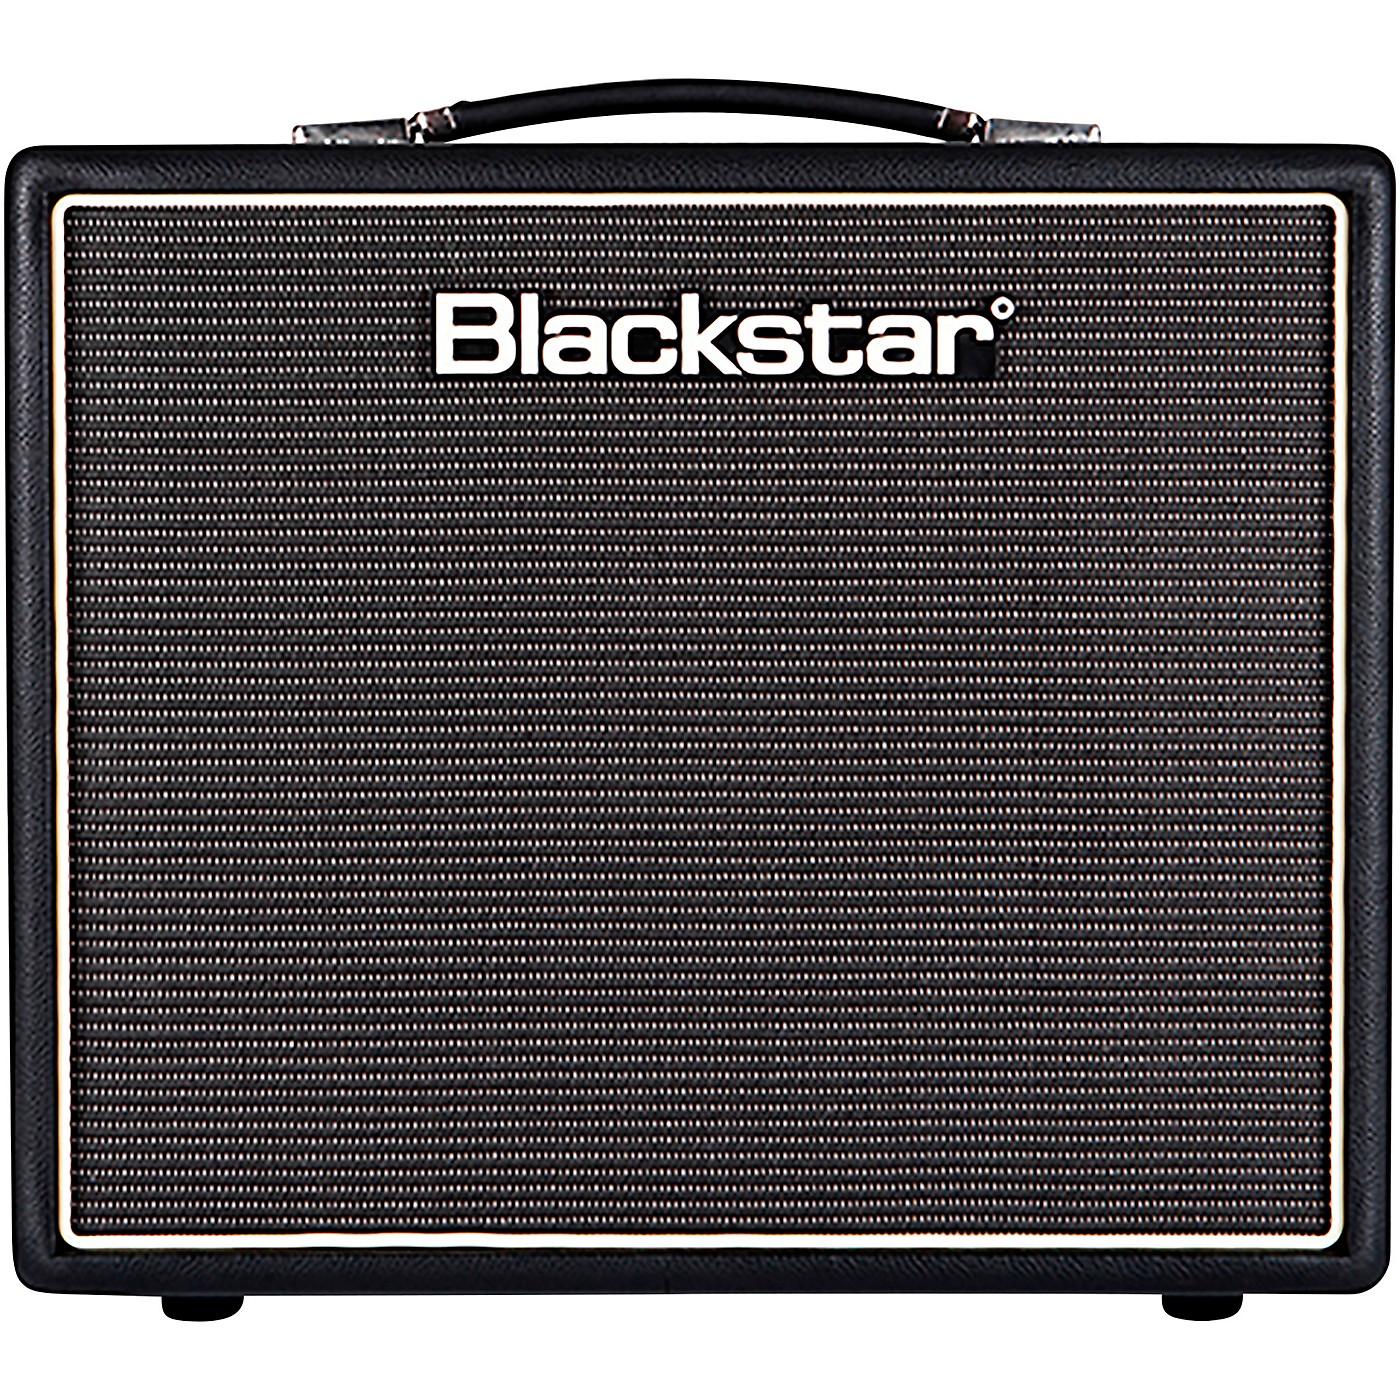 Blackstar Studio 10 EL34 10W 1x12 Tube Hybrid Guitar Combo Amp thumbnail